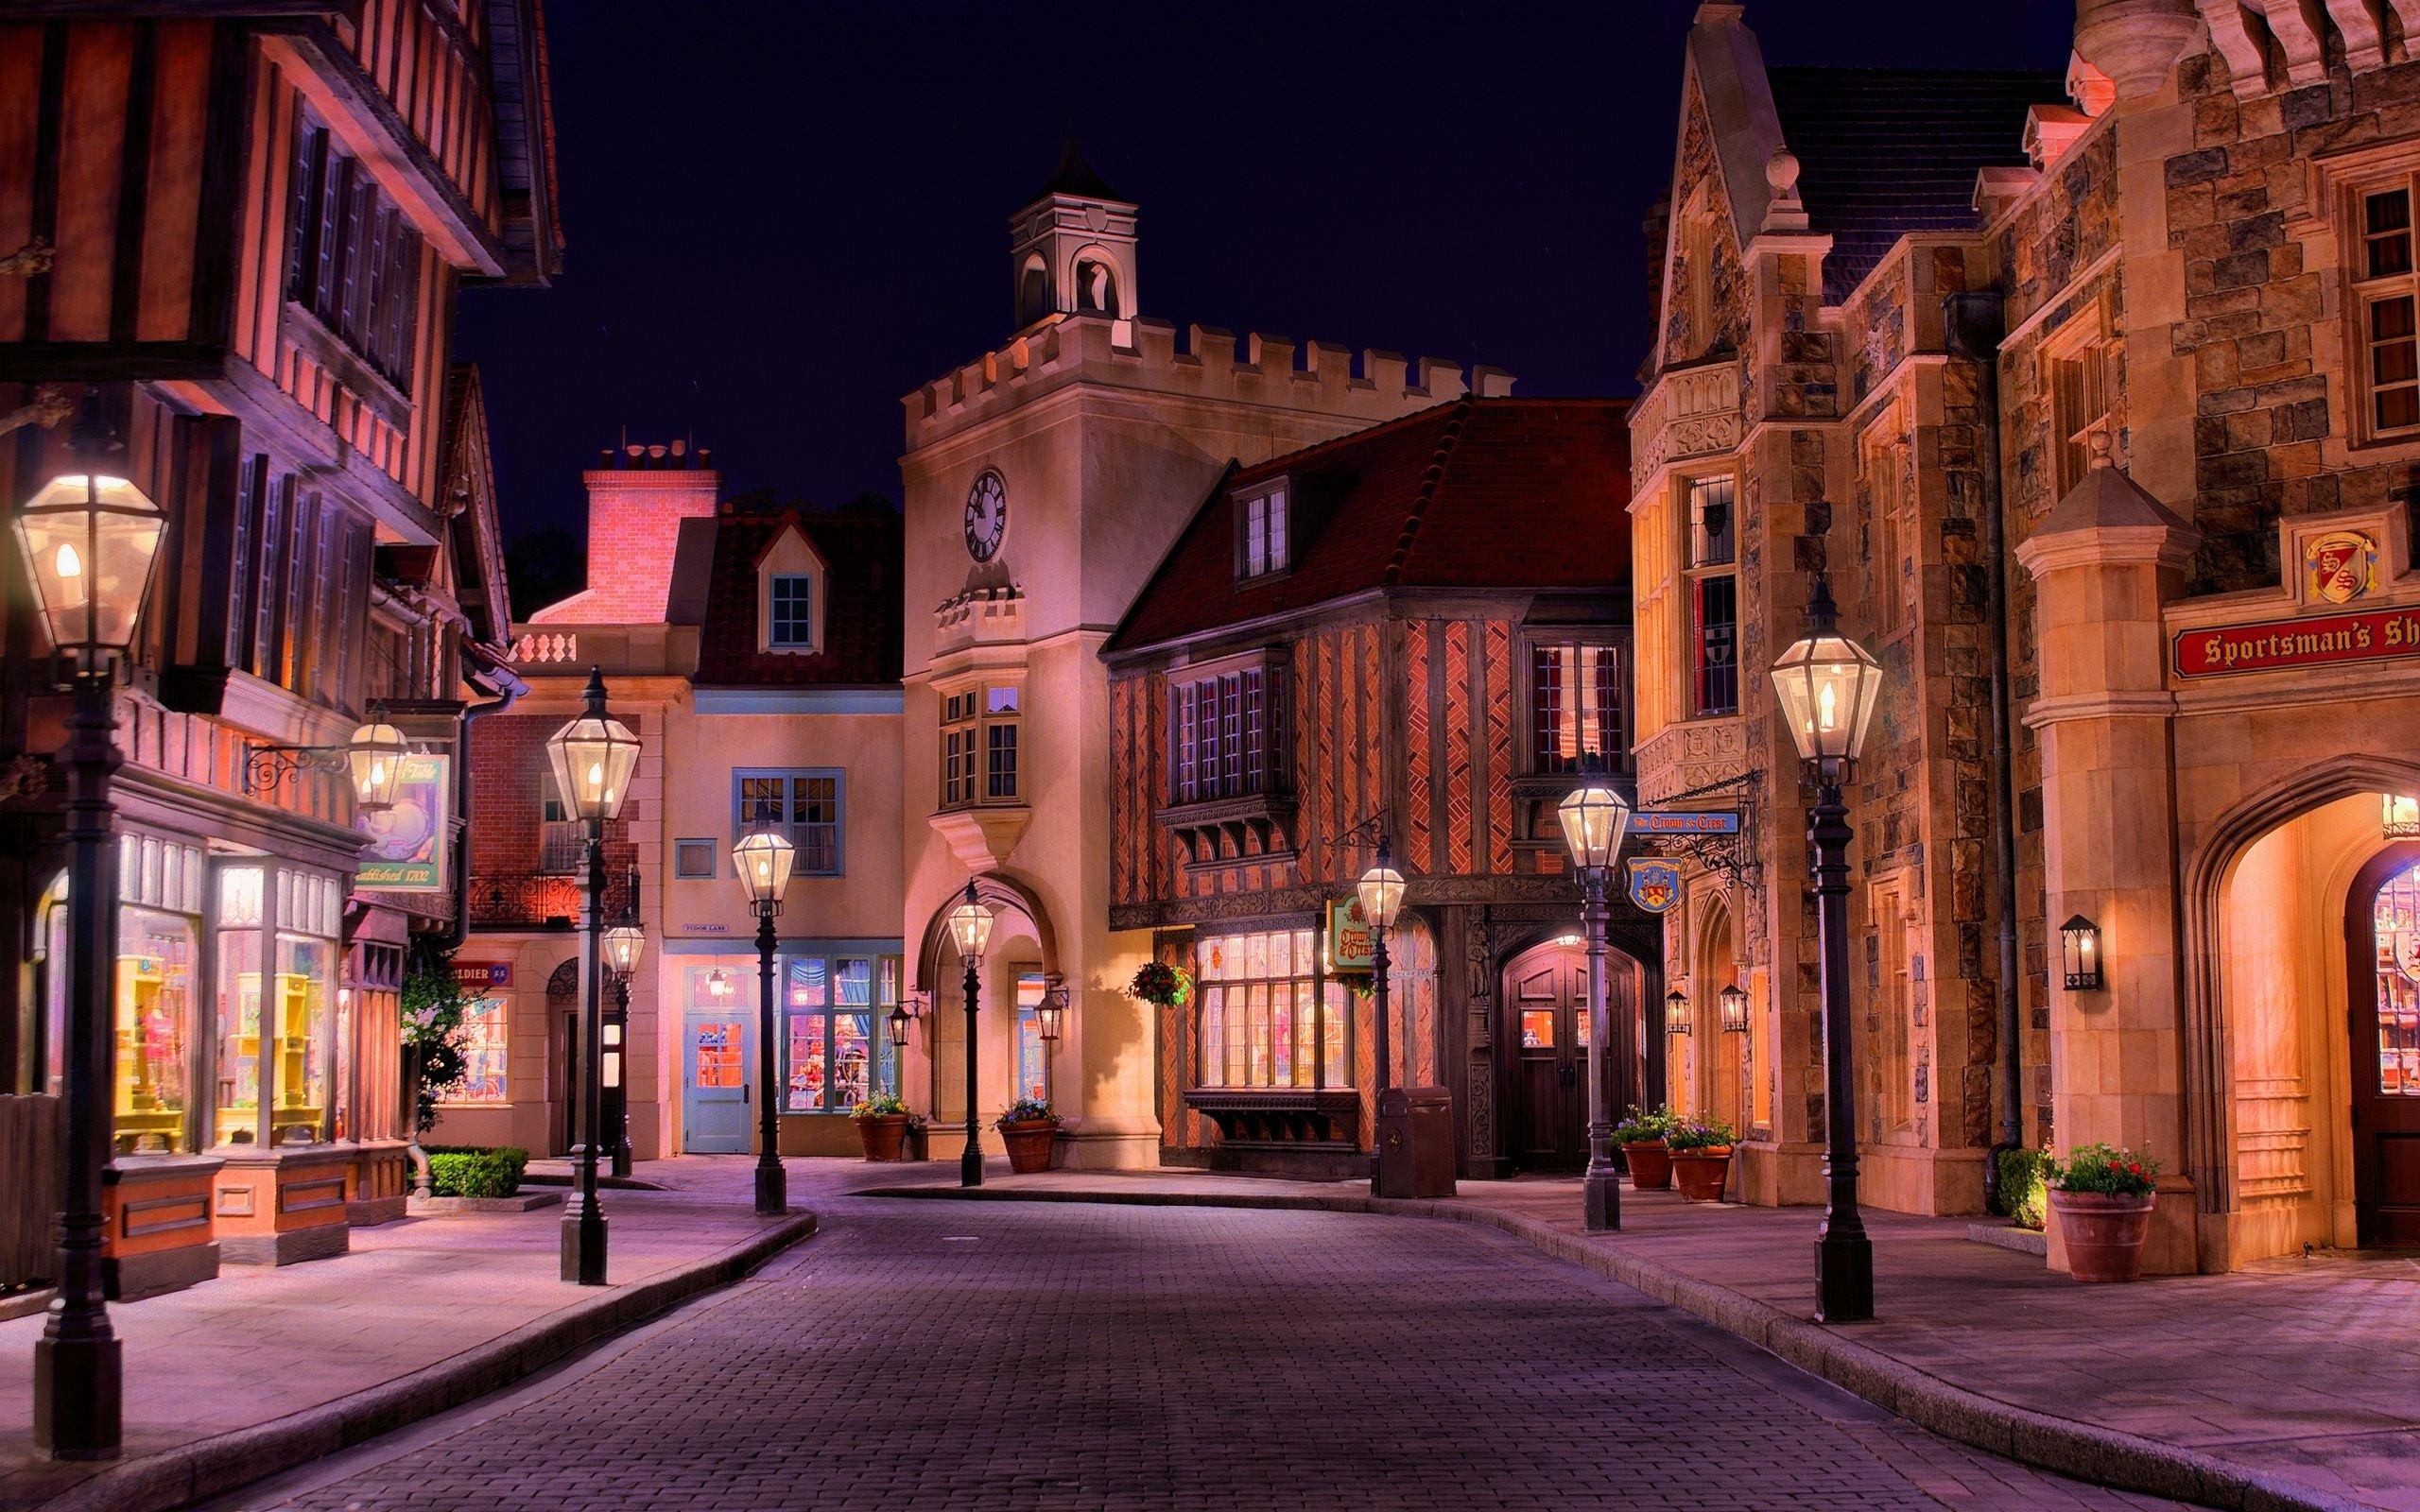 Romantic city street